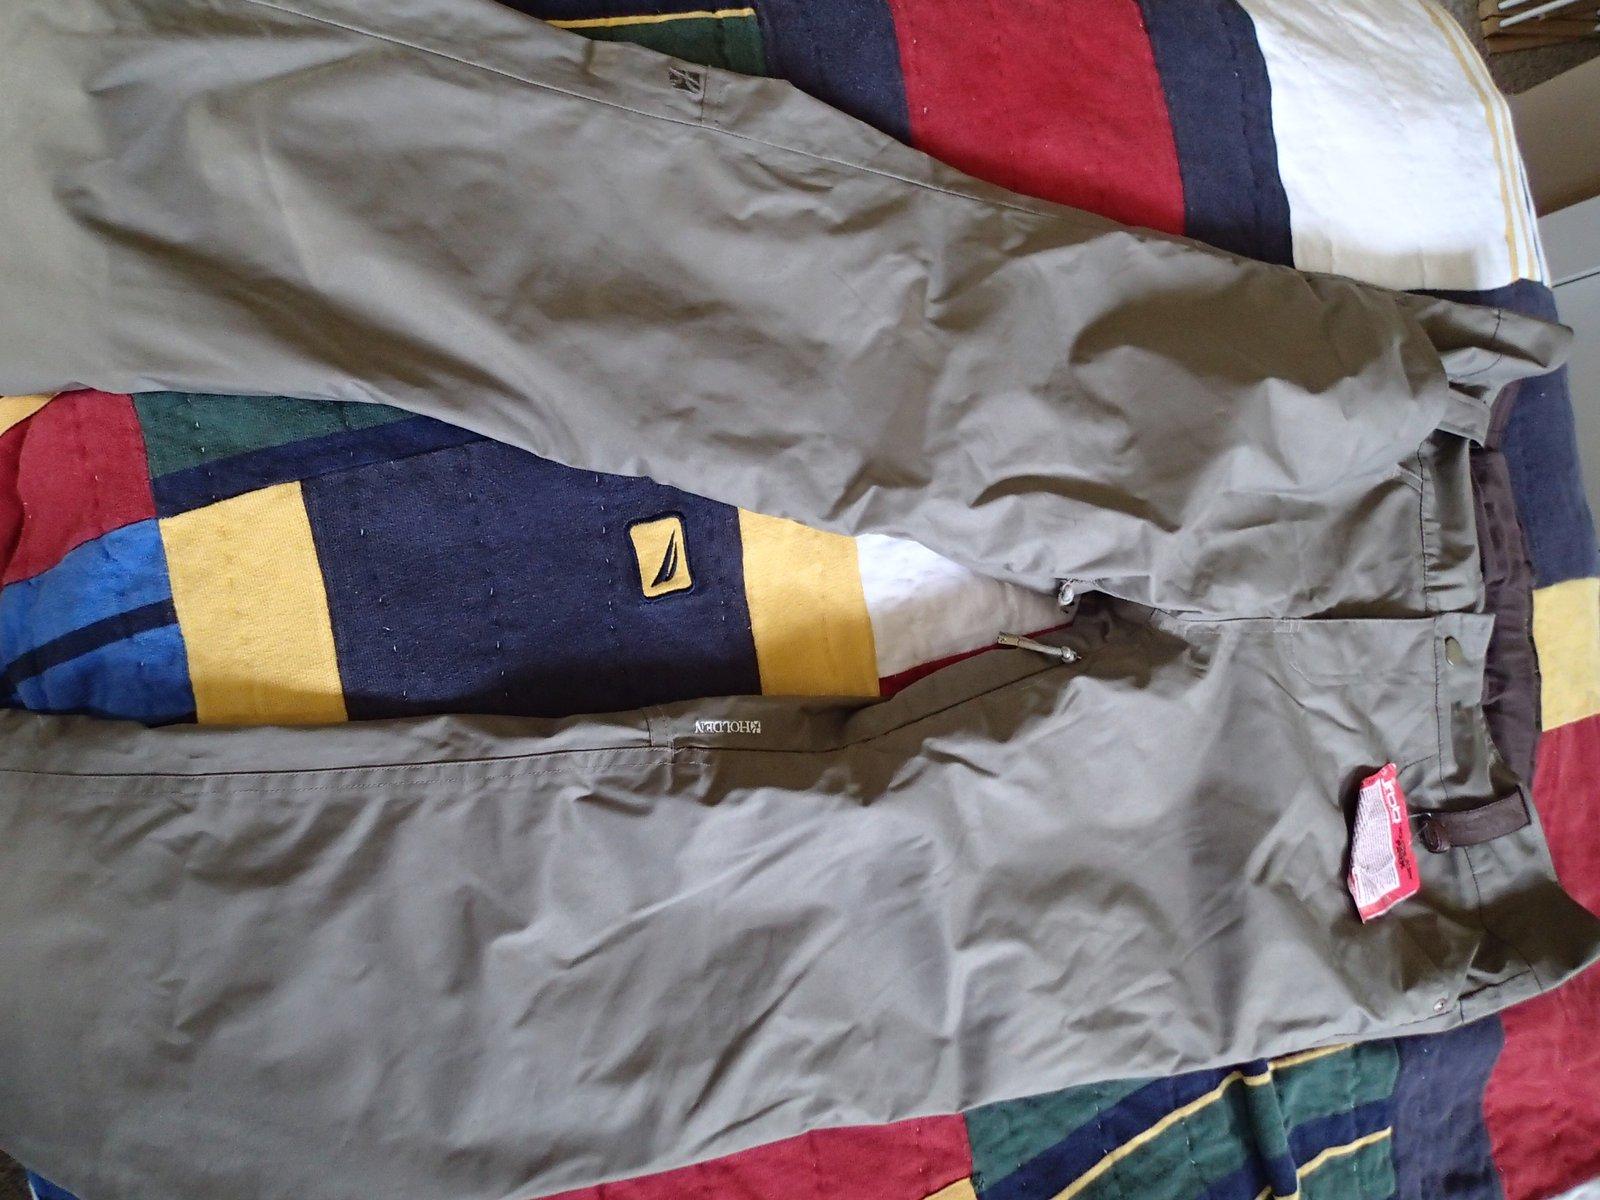 Holden pants